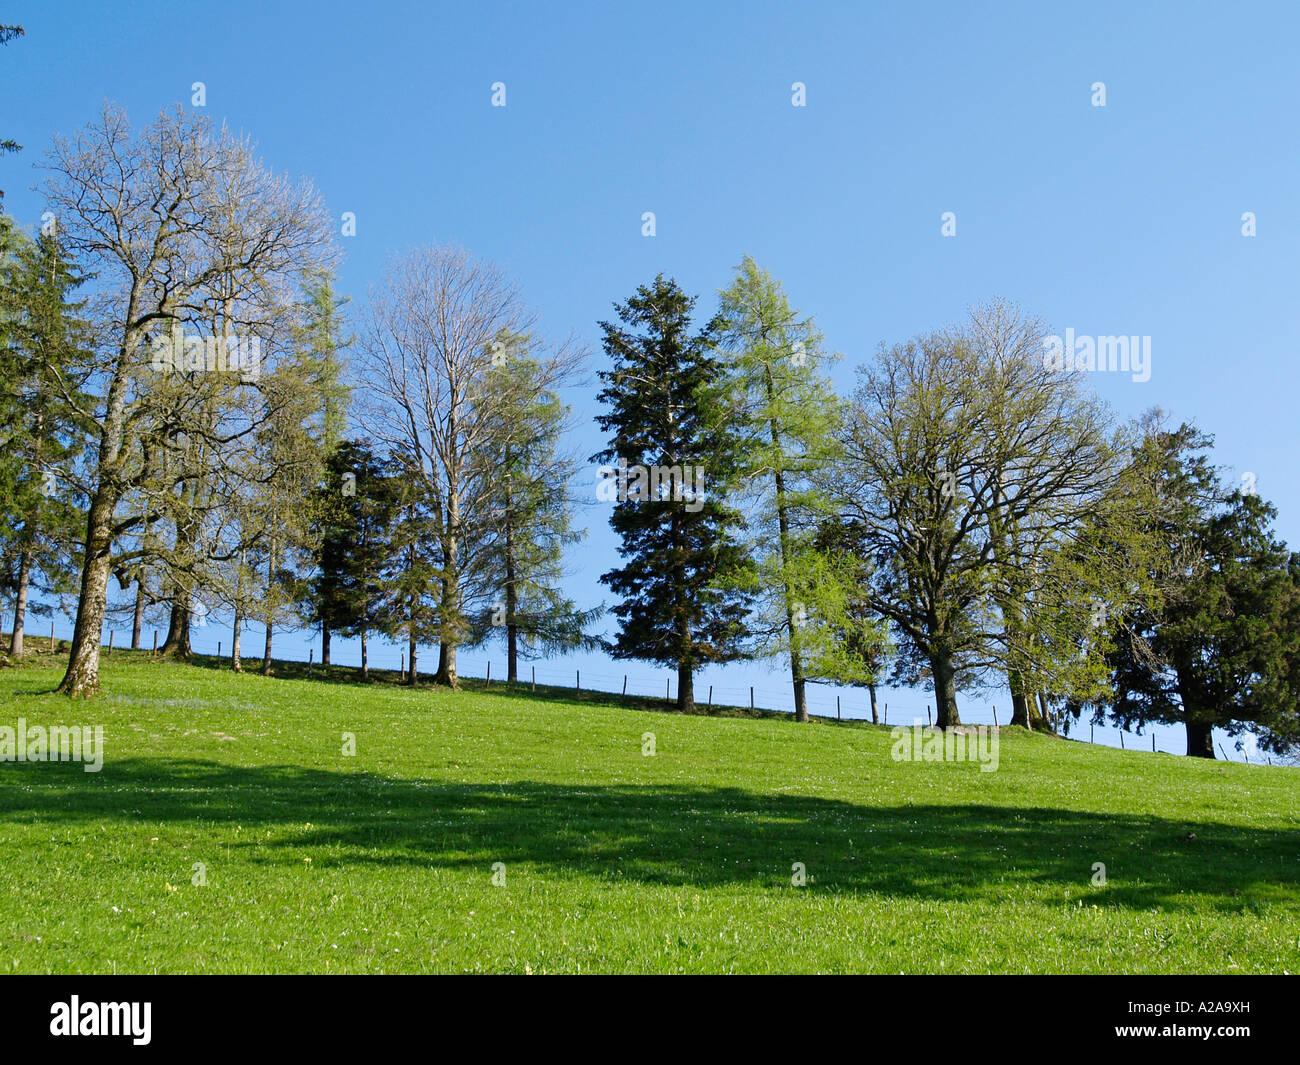 Tree Row Deciduous Trees An Conifers Stock Photos & Tree Row ...